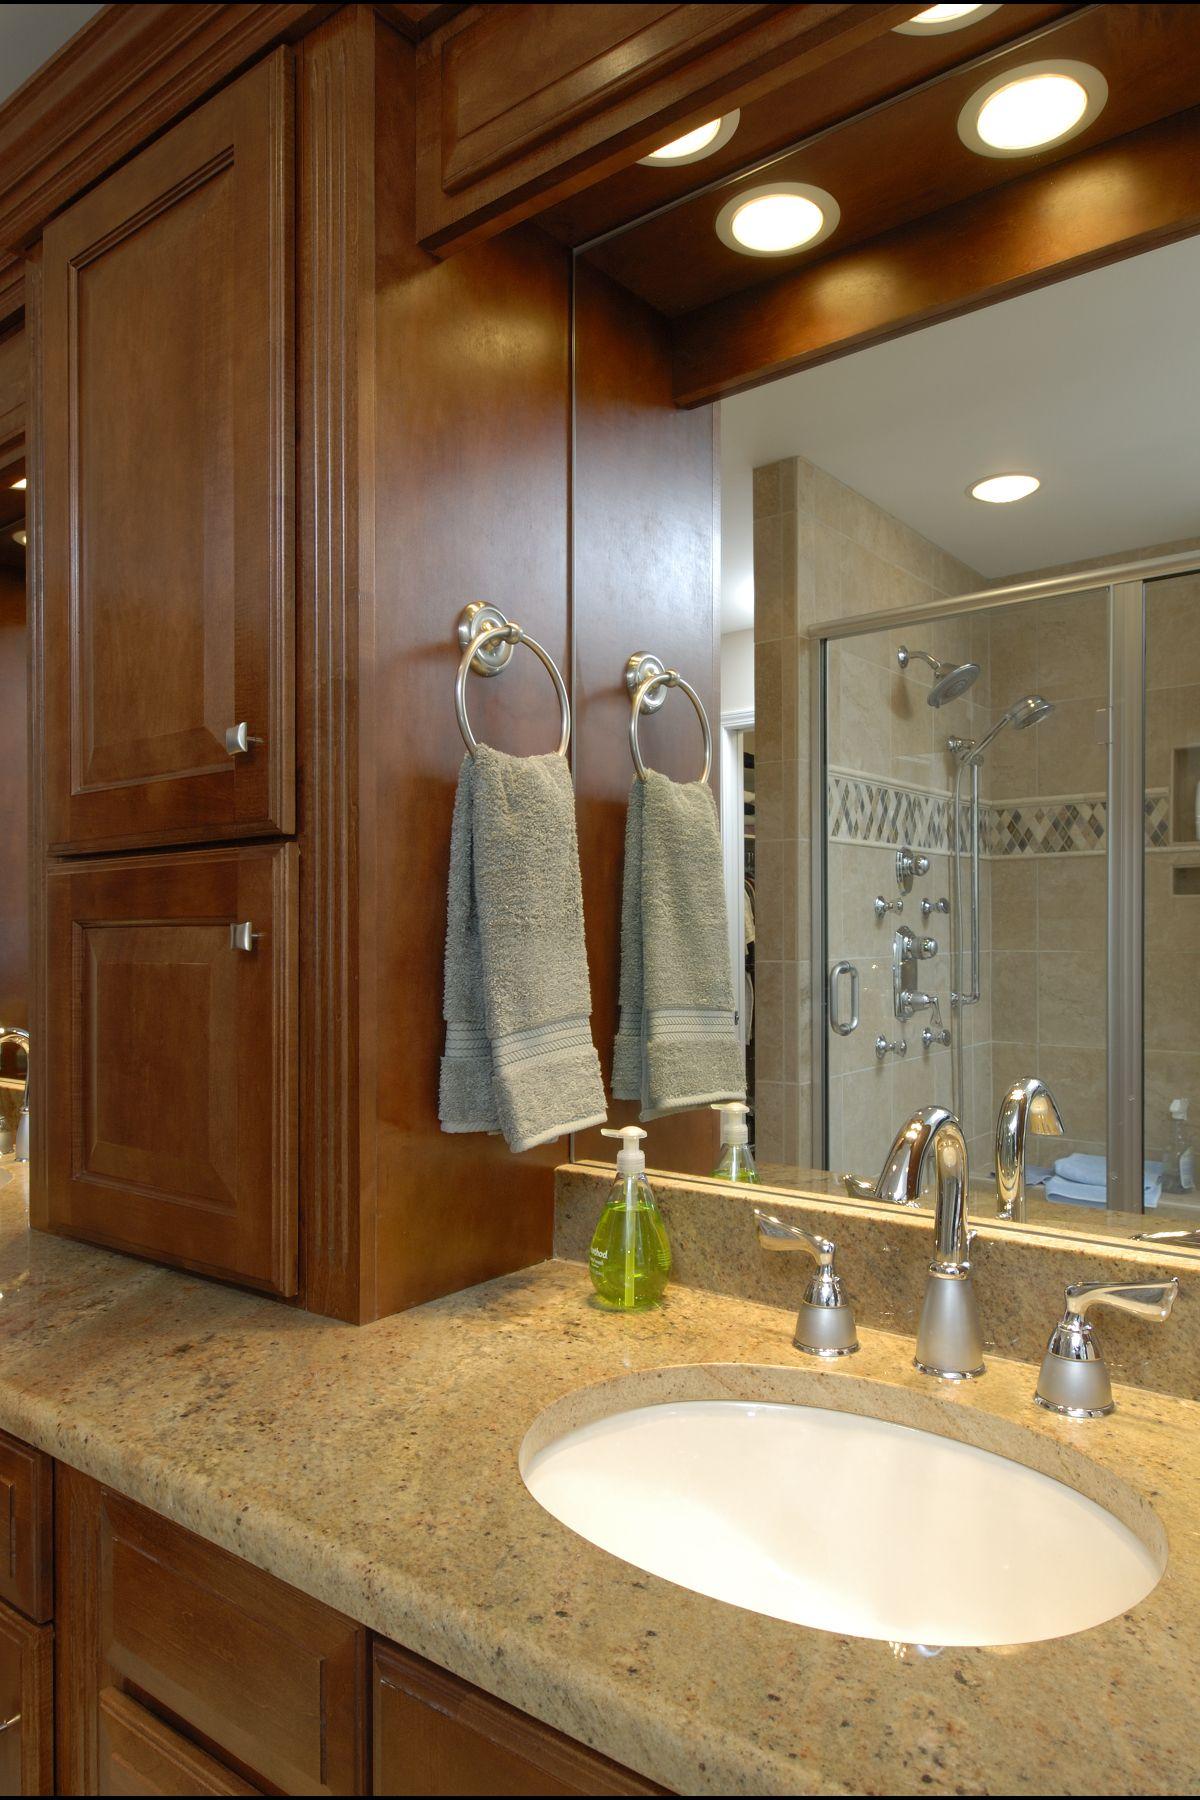 Ordinaire Bathroom Remodel By DeHaan Remodeling Specialsts Kalamazoo MI